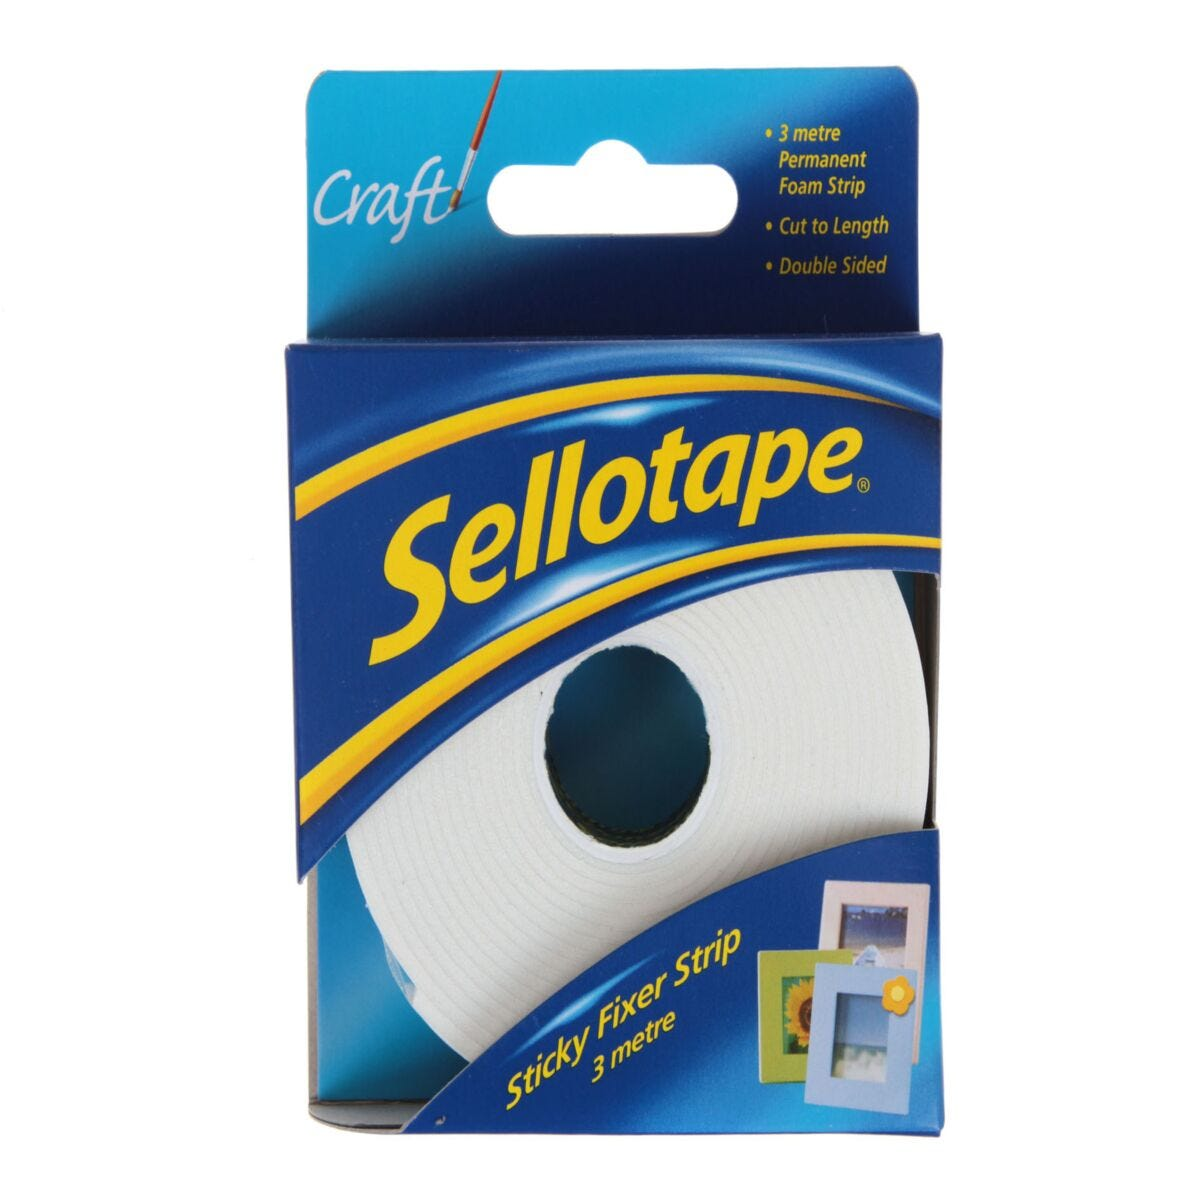 Sellotape Sticky Fixers 25mm x 3m Strip